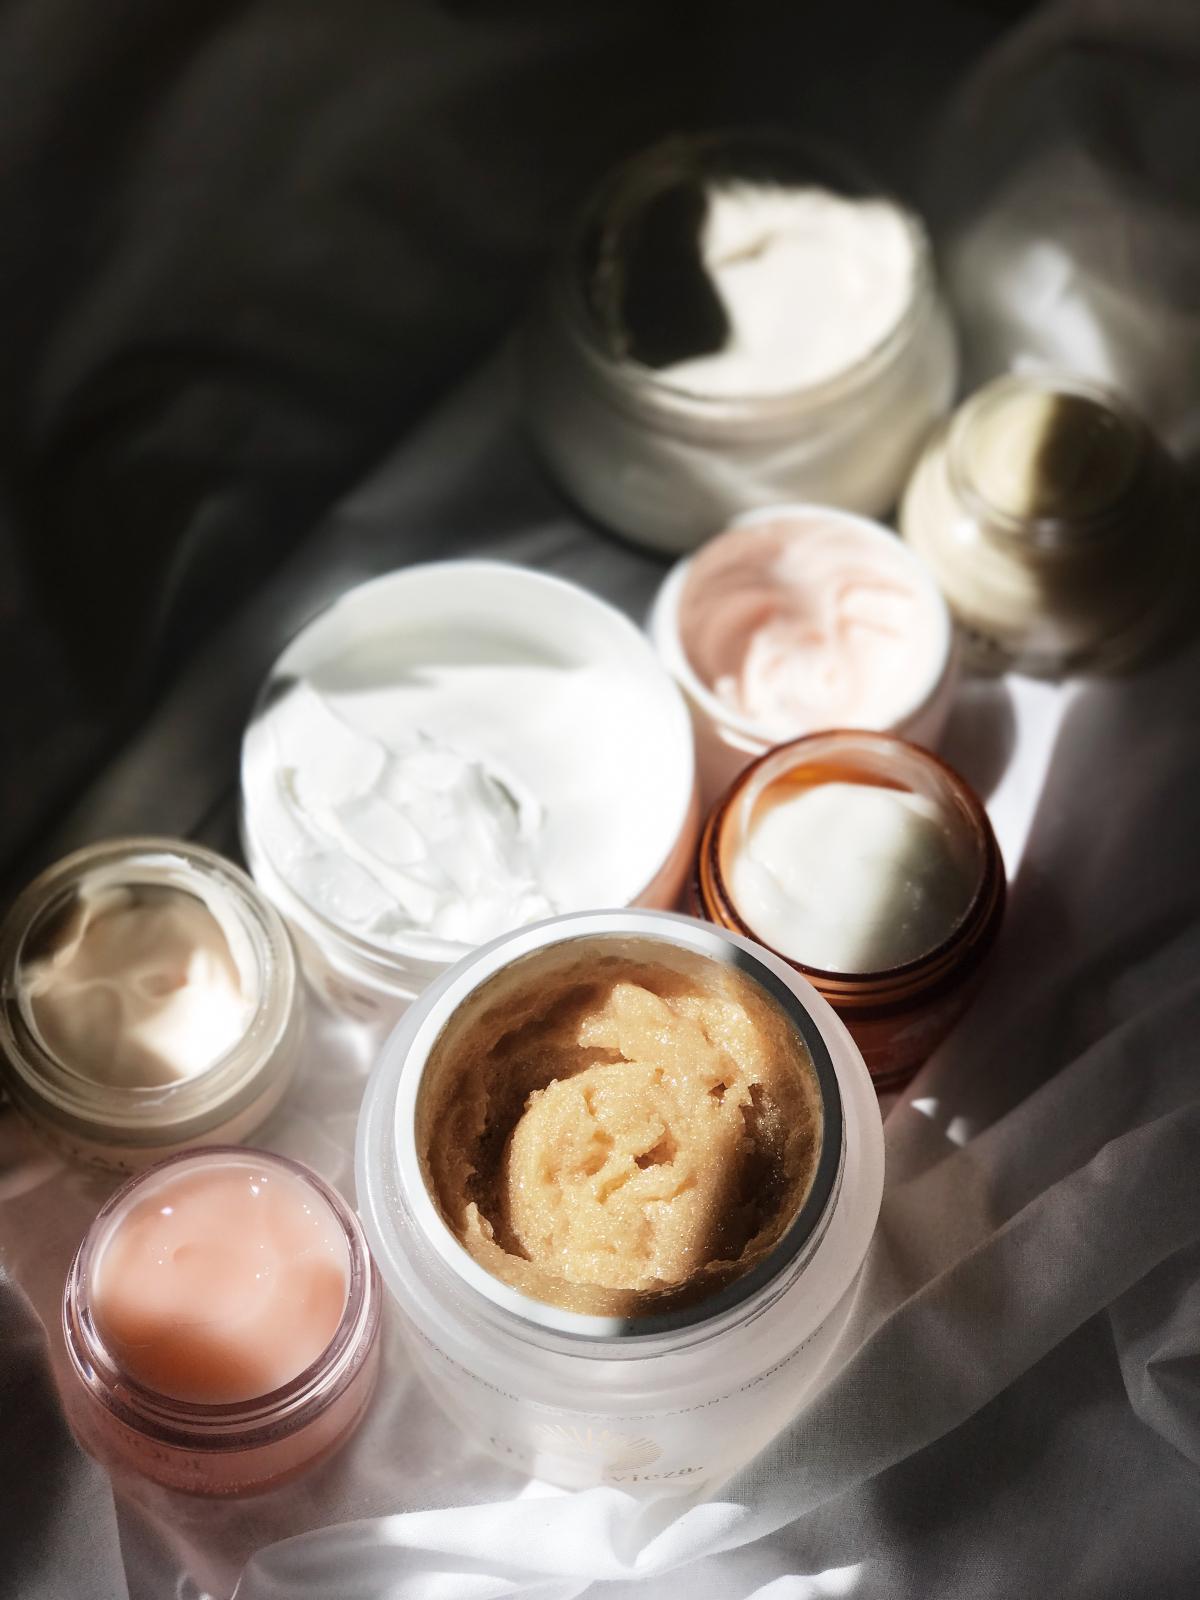 How 2020 Has Shaped My Beauty Spending Habits